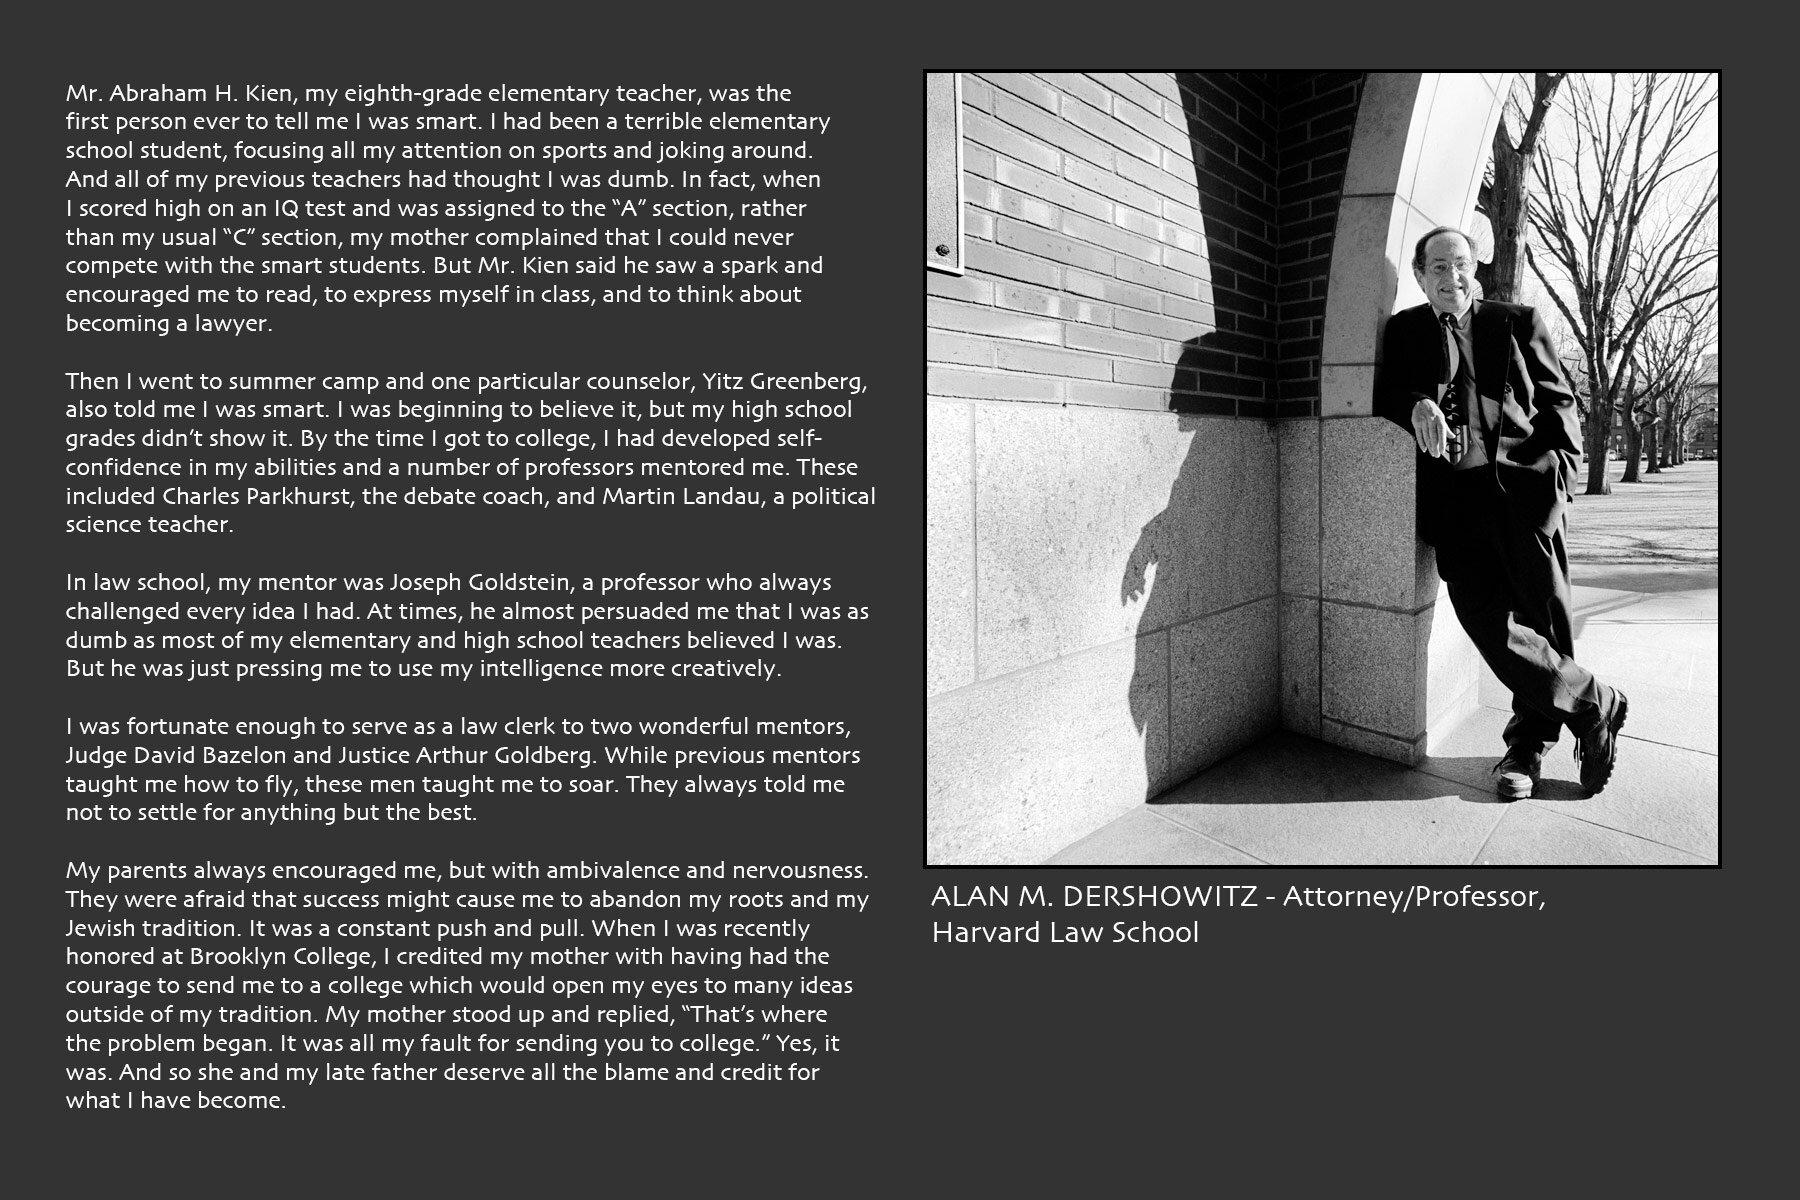 26-Mentors-Alan-Dershowitz-tsar-fedorsky.jpg